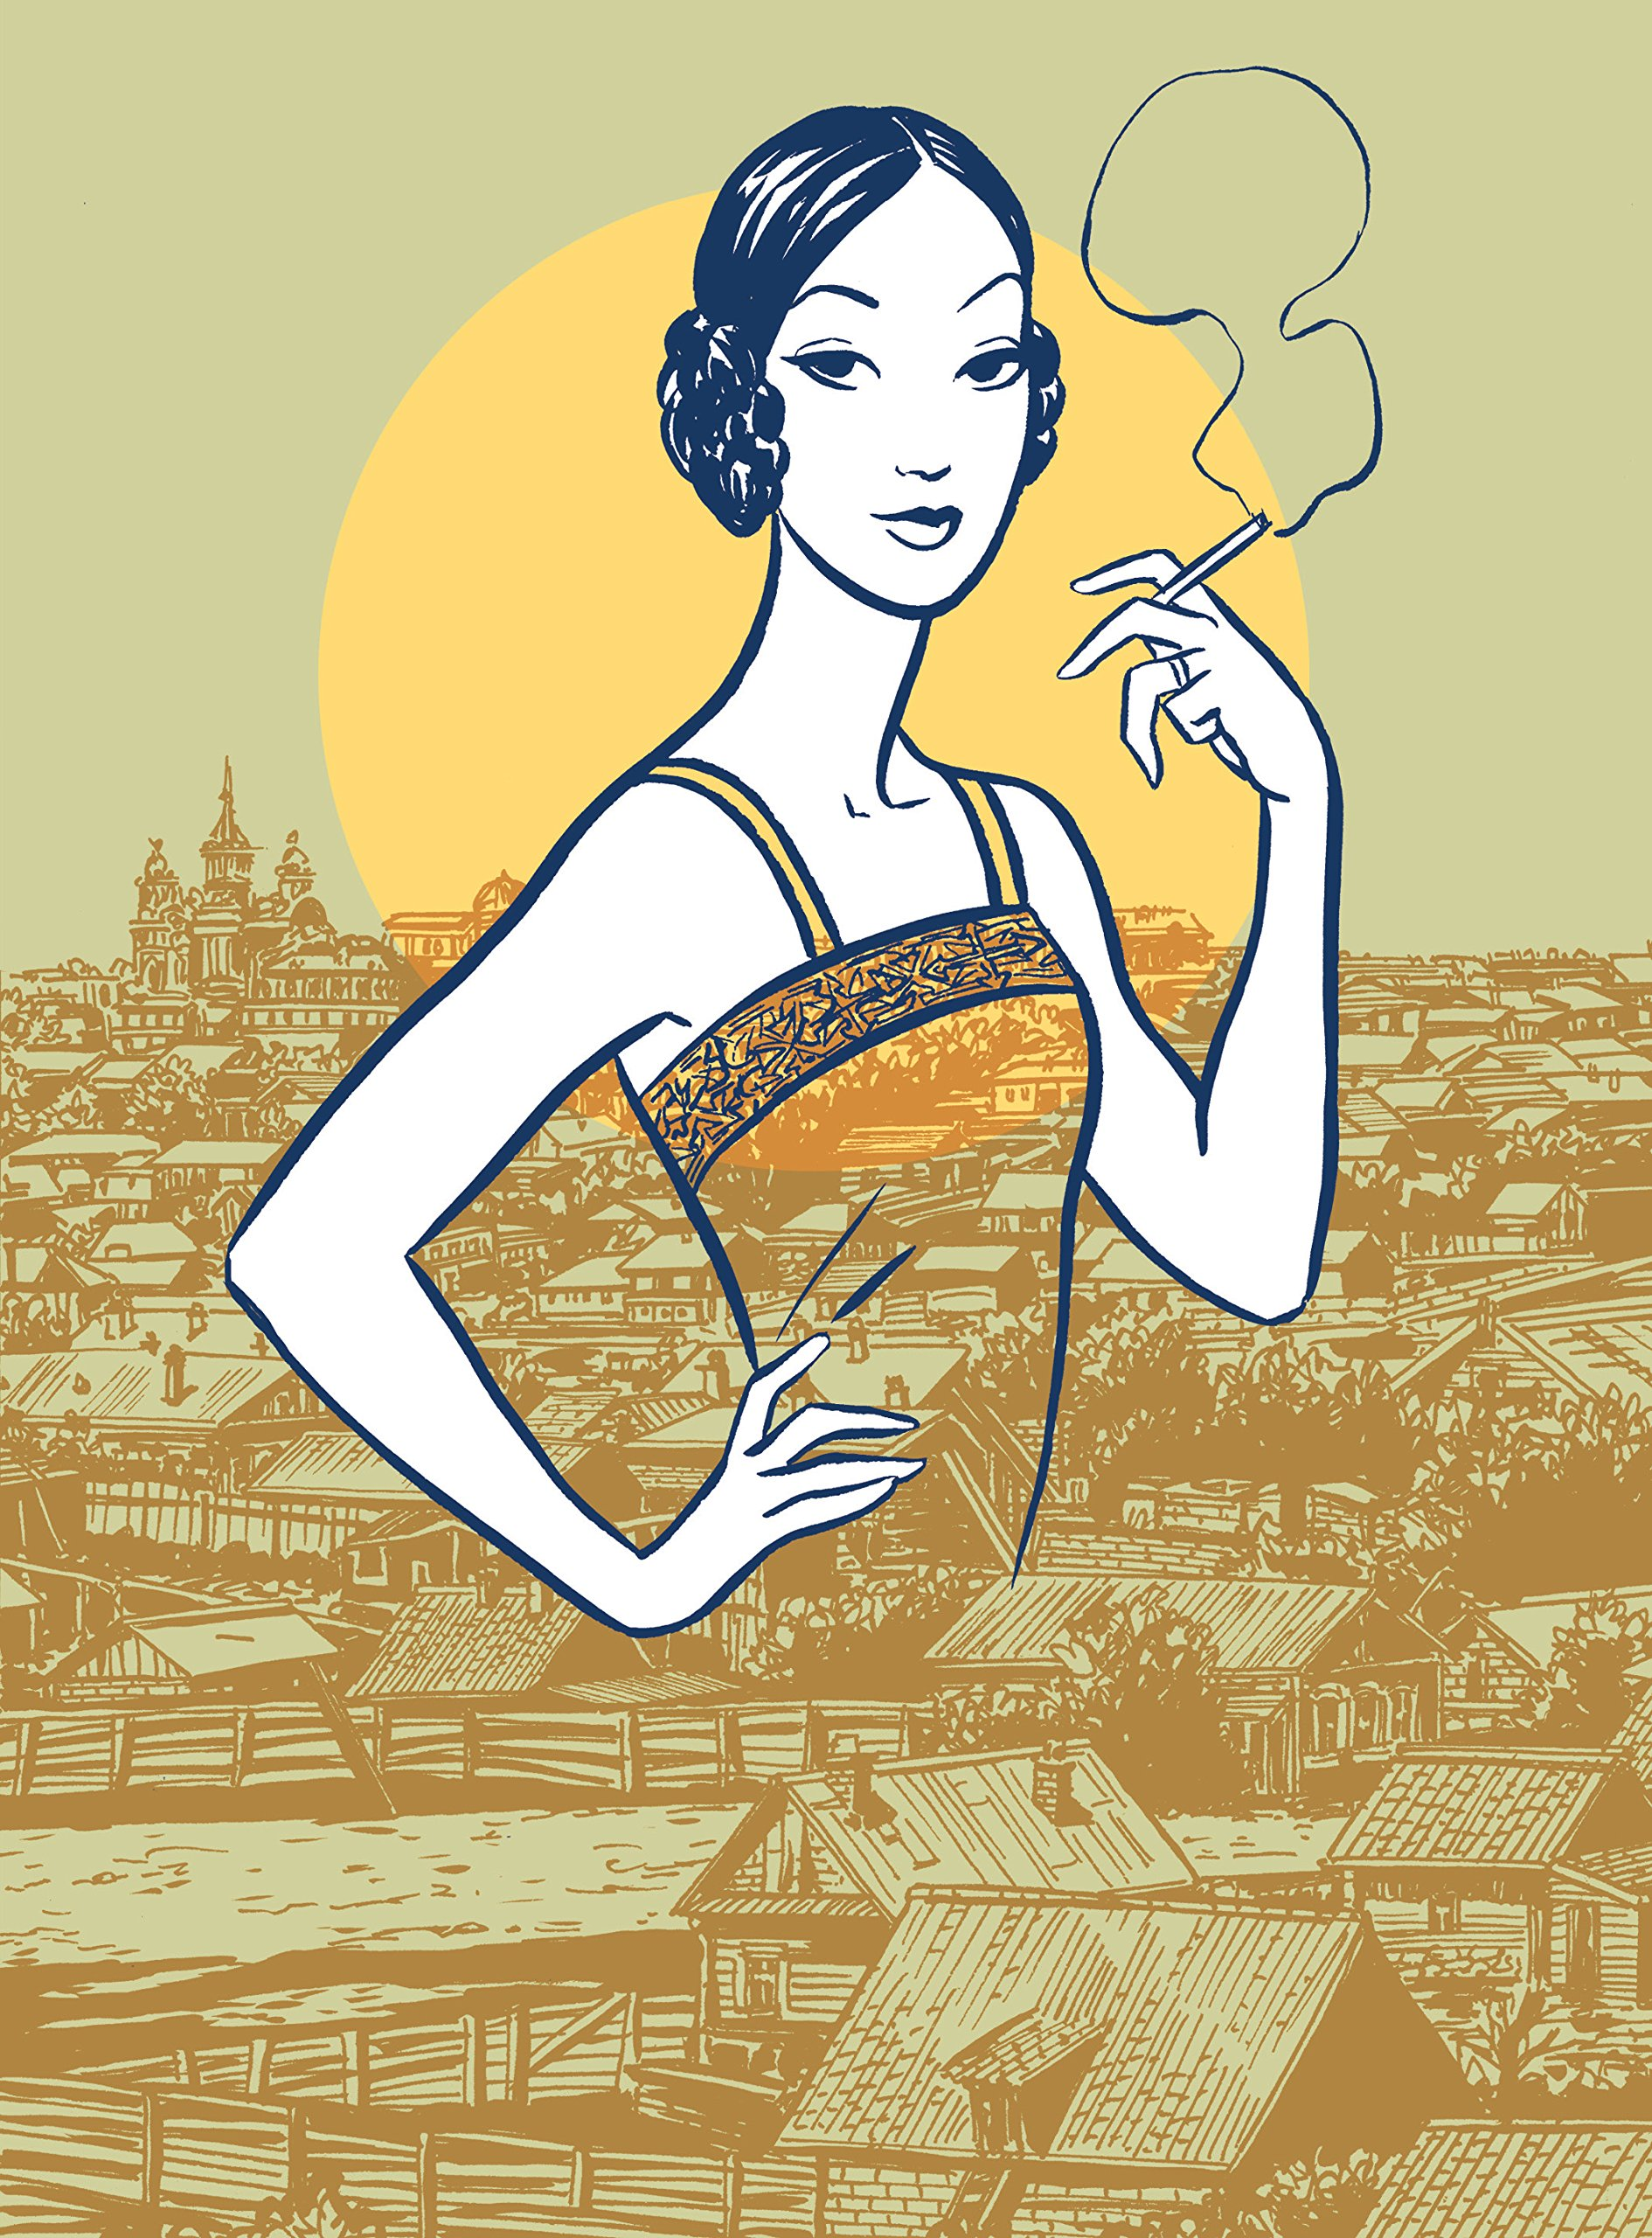 Adieu Kharkov : Tome 1: Amazon.co.uk: Mylène Demongeot, Catel, Claire  Bouilhac: 9782800162874: Books